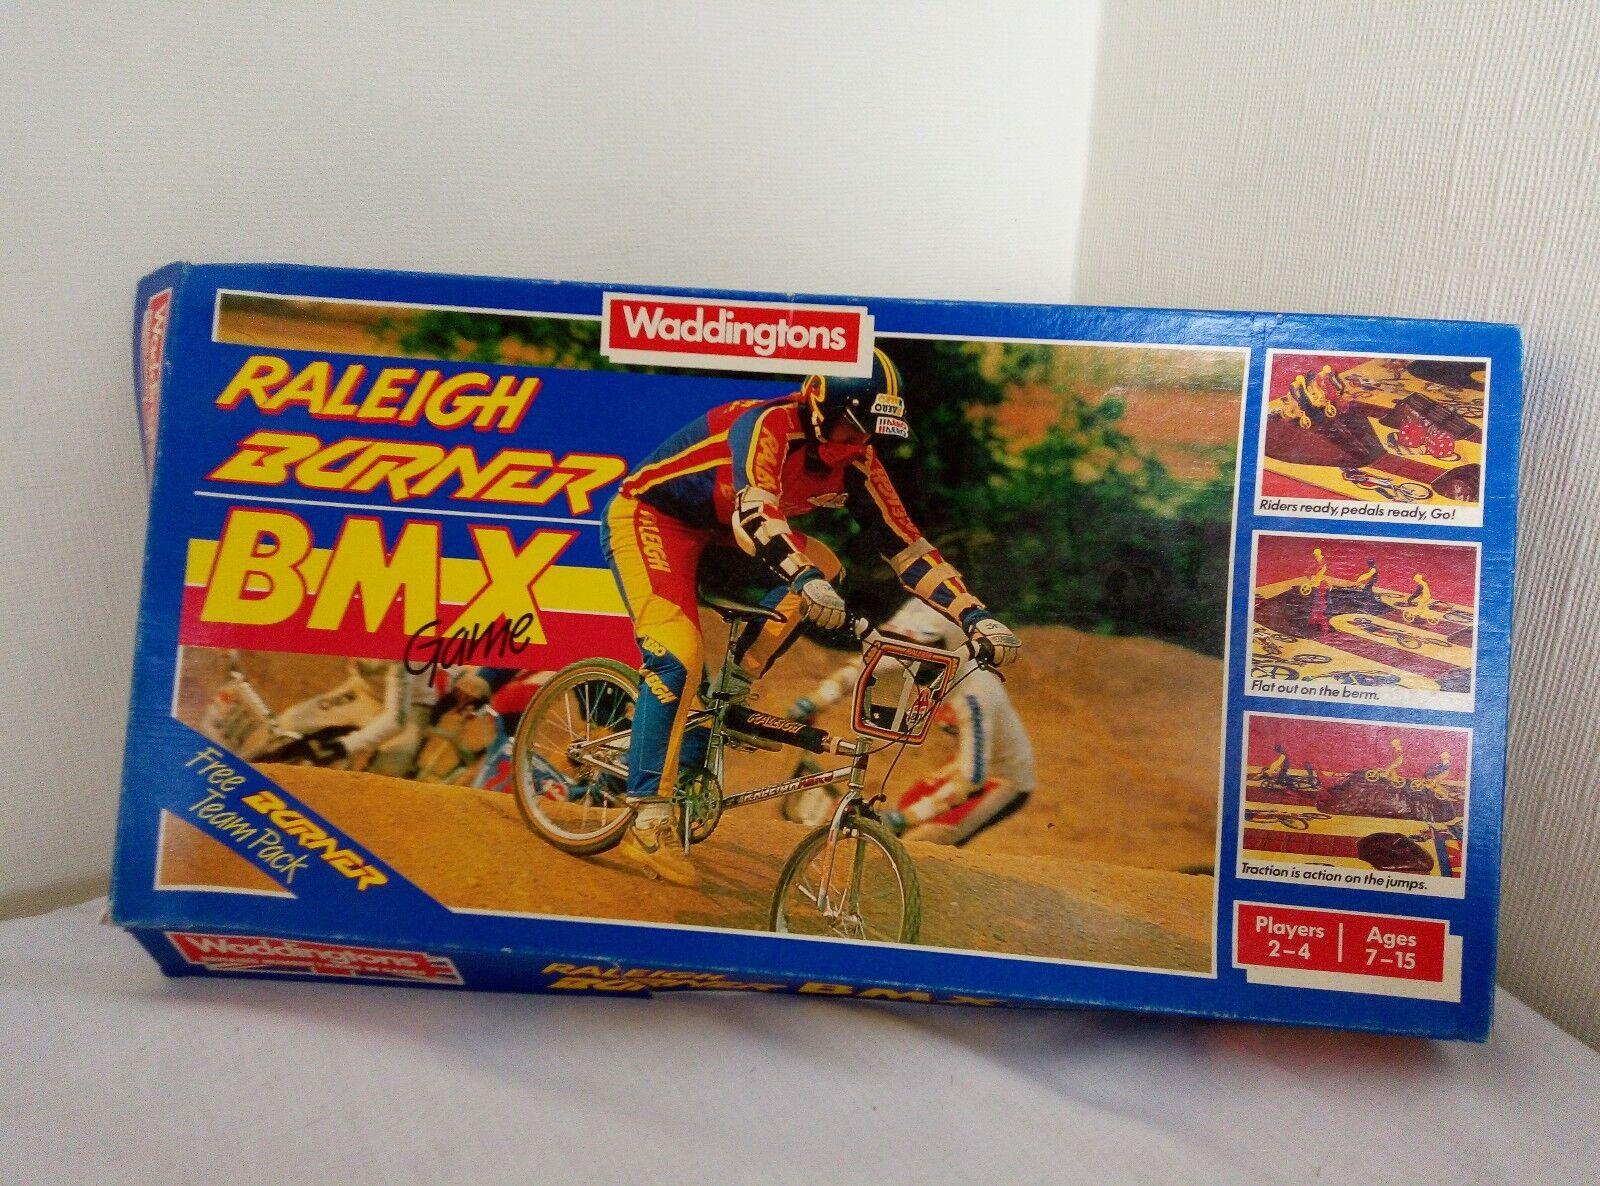 Raleigh brenner bmx - retro - spiel waddingtons boxed 1985